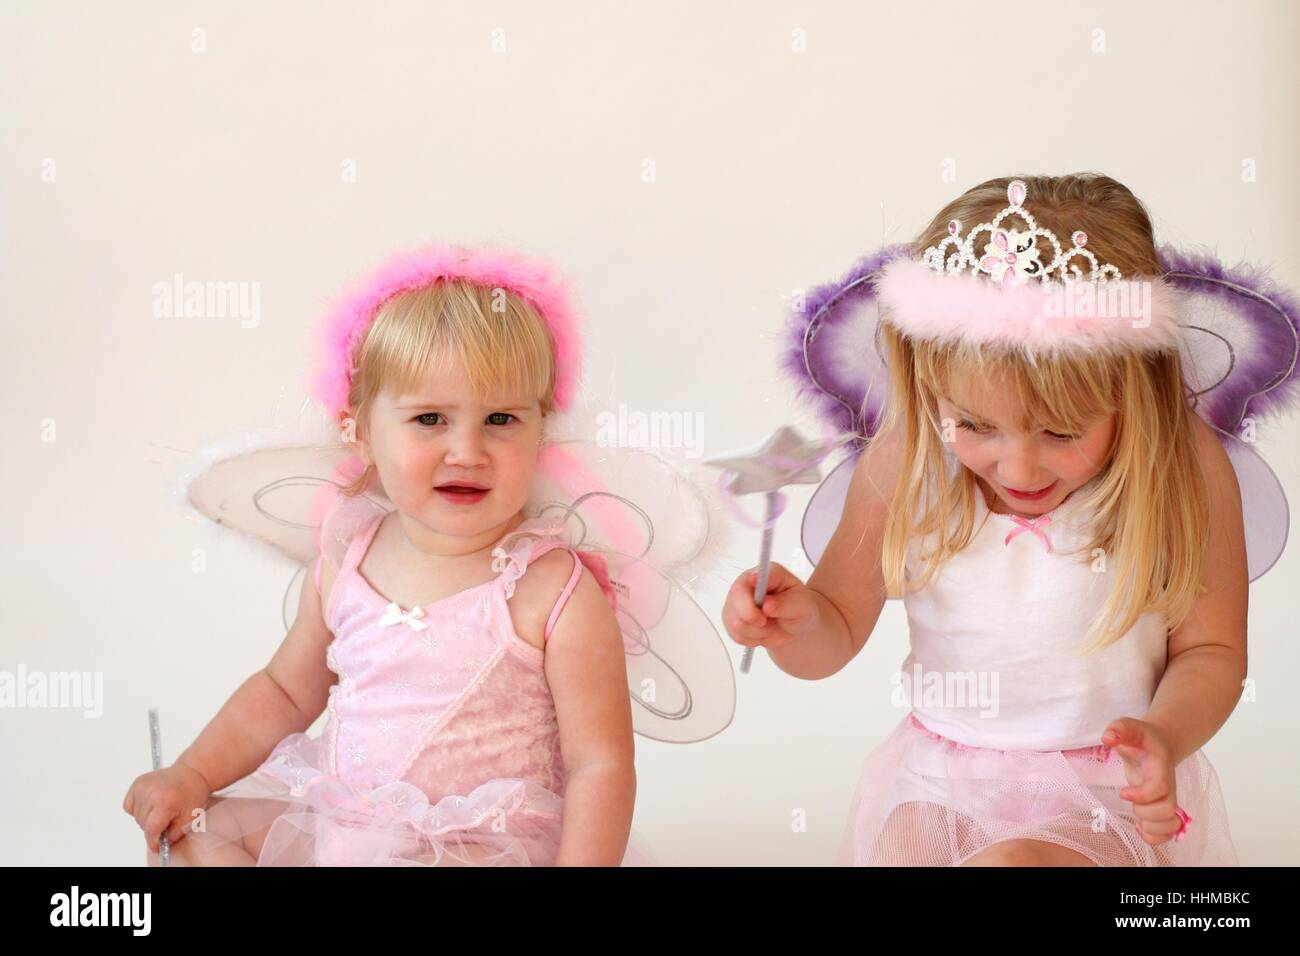 da5014d43 Fairy Costumes Tutu Fairy Wings Wand Stock Photos & Fairy Costumes ...